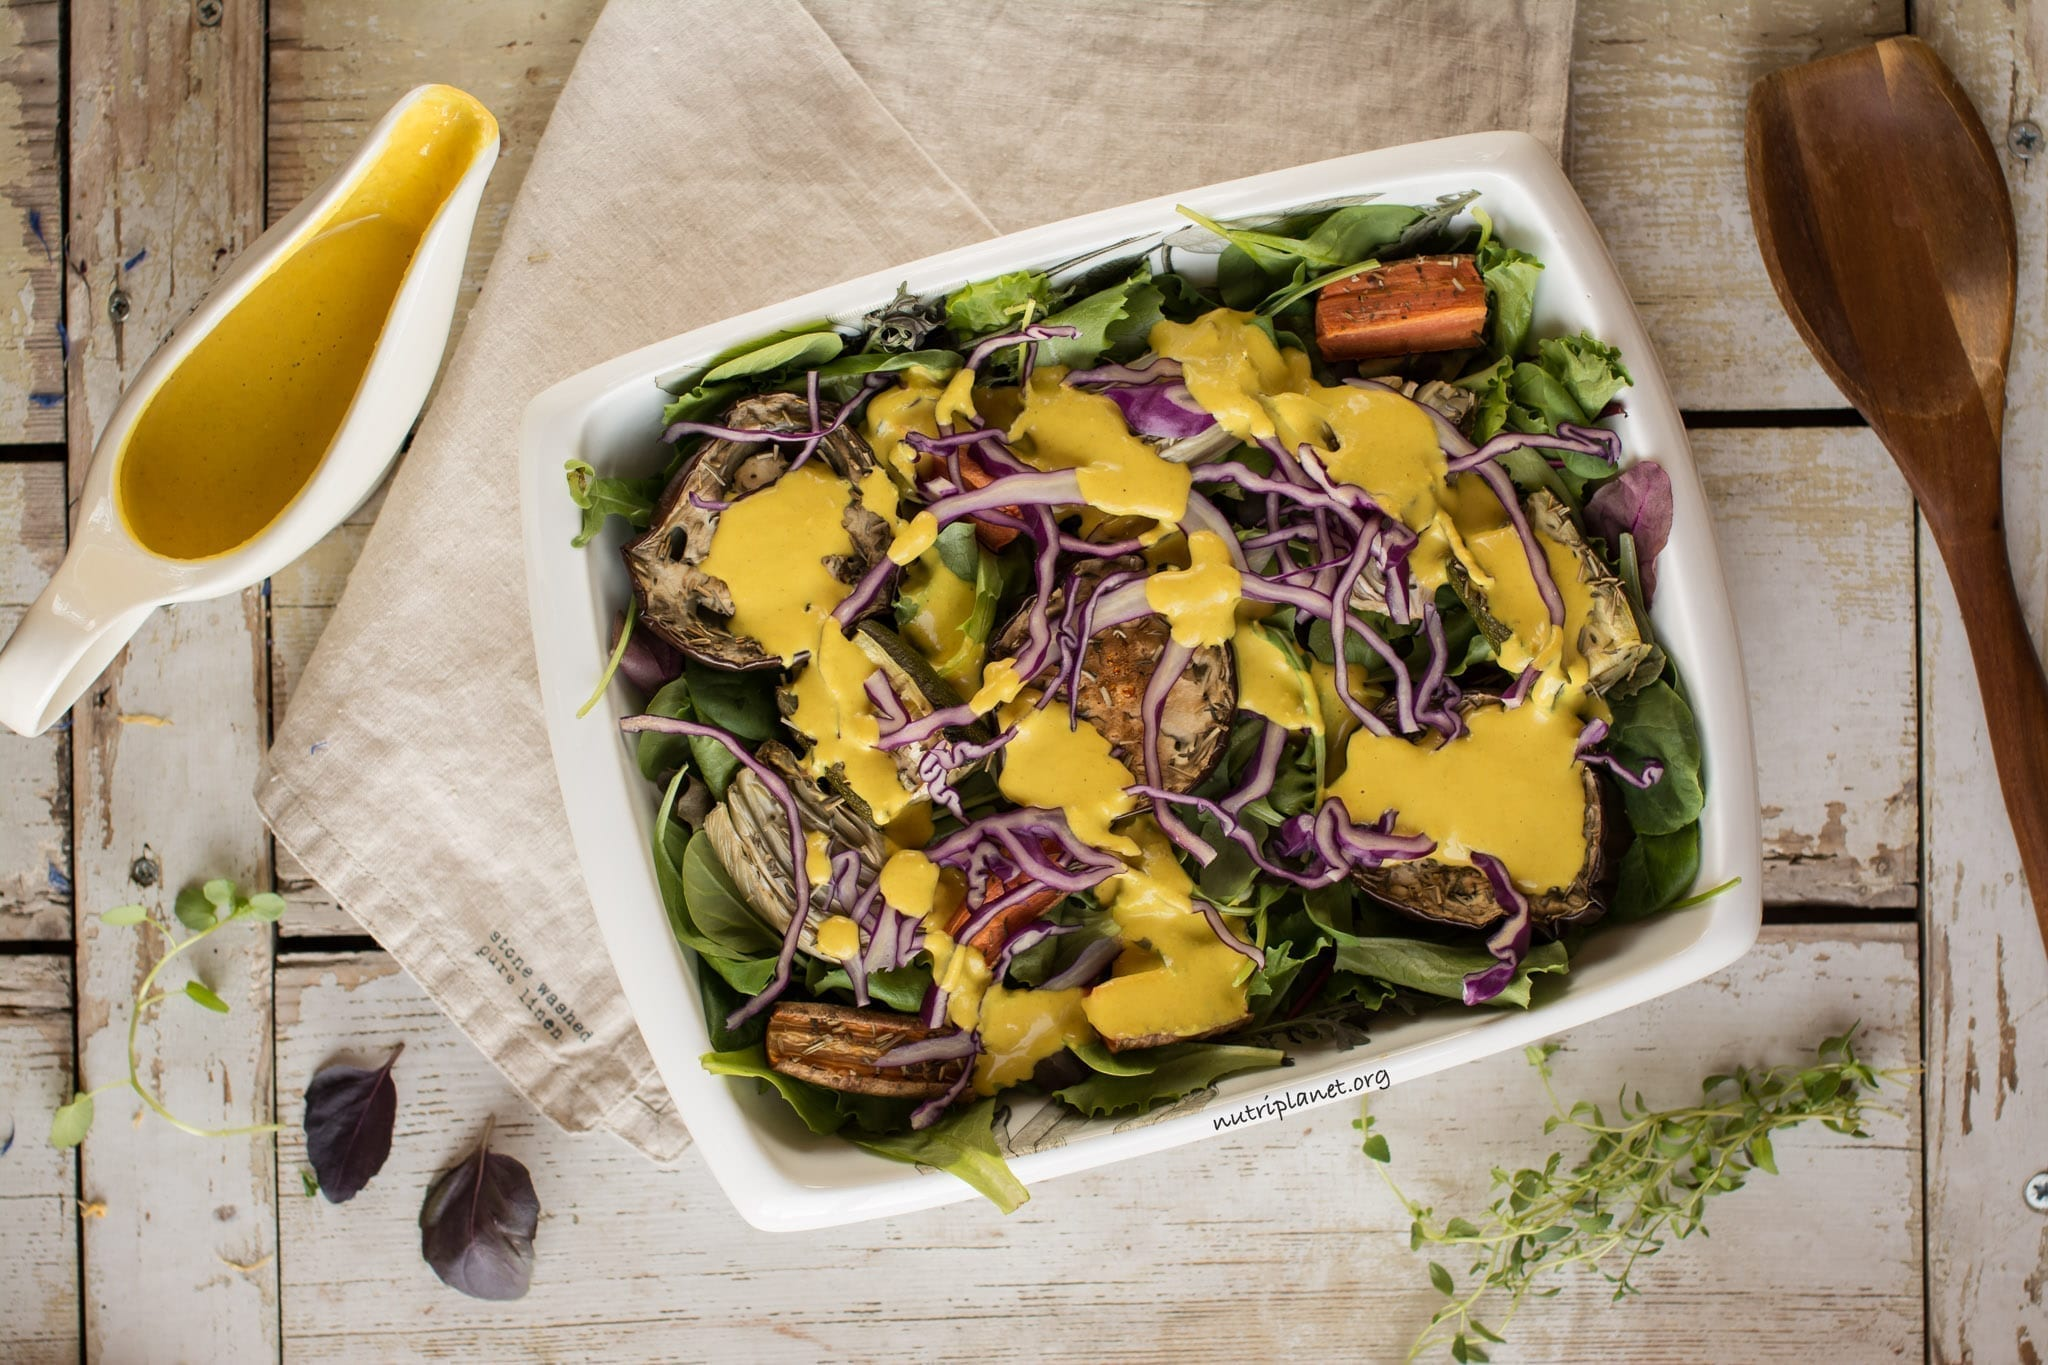 Vegan Salad with Roasted Veggies and Tahini Dressing